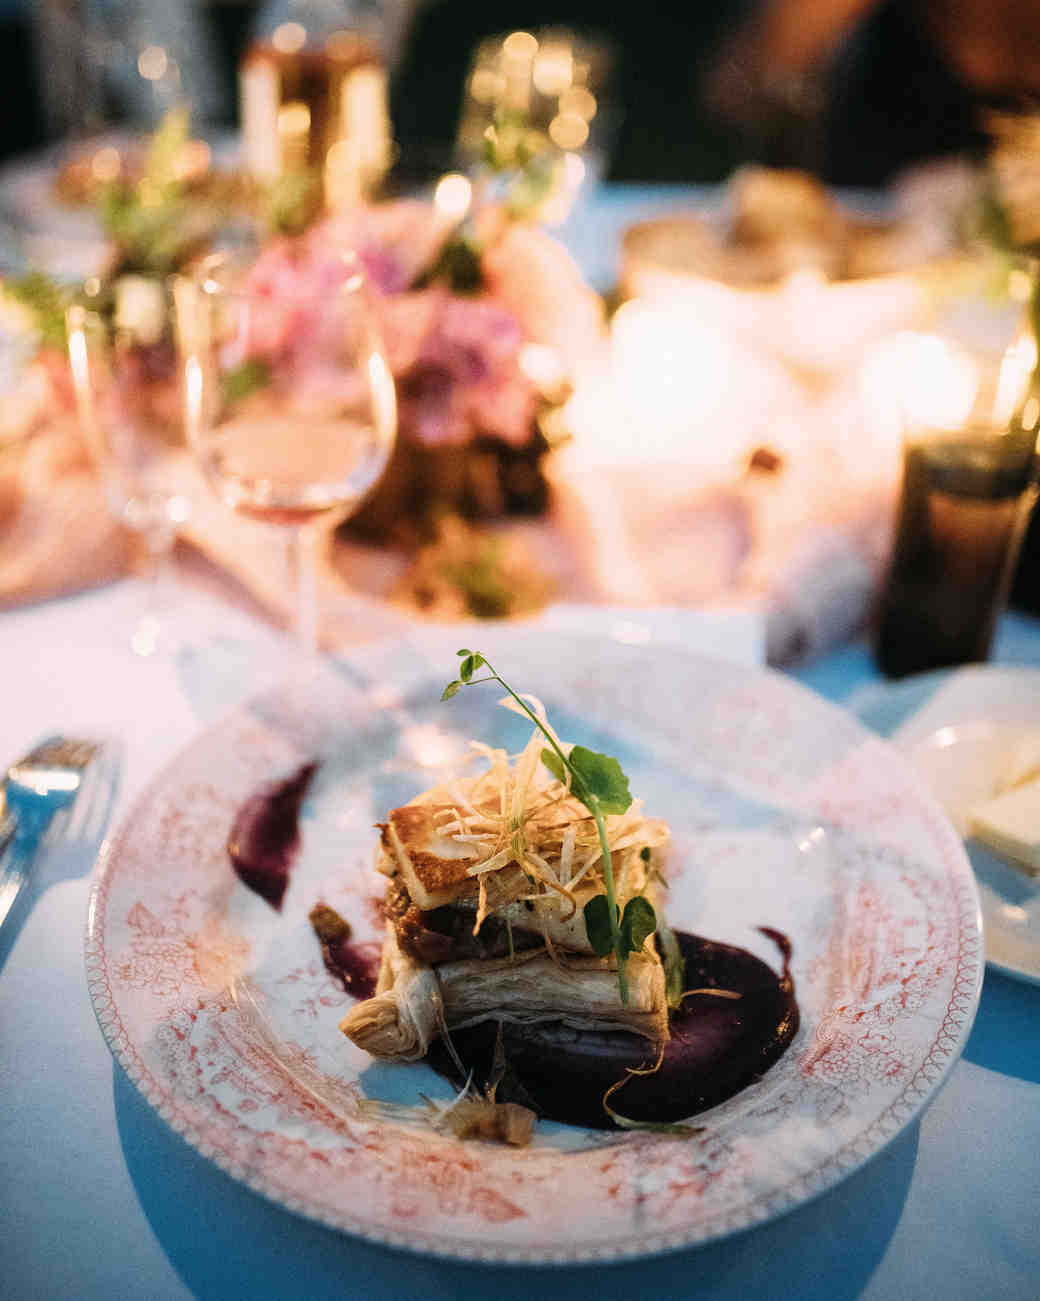 thomas jared wedding reception food table setting